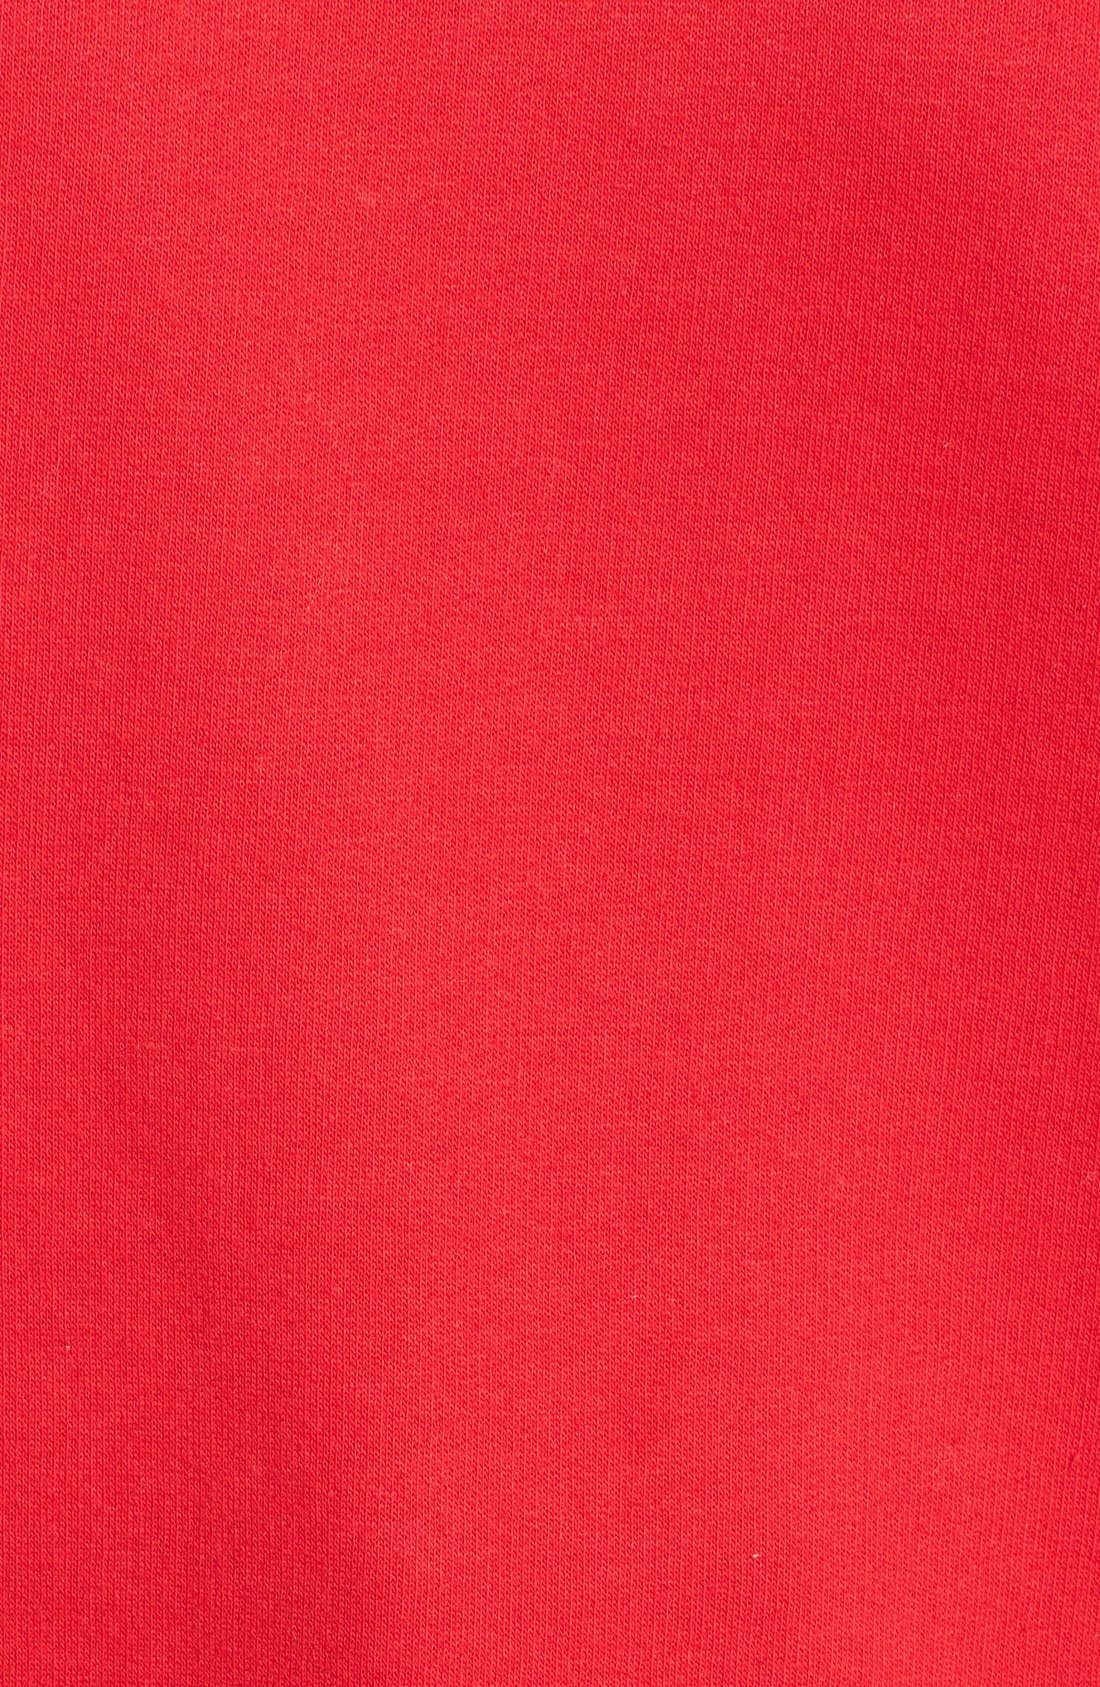 Alternate Image 5  - Volcom Hesh Graphic Pullover